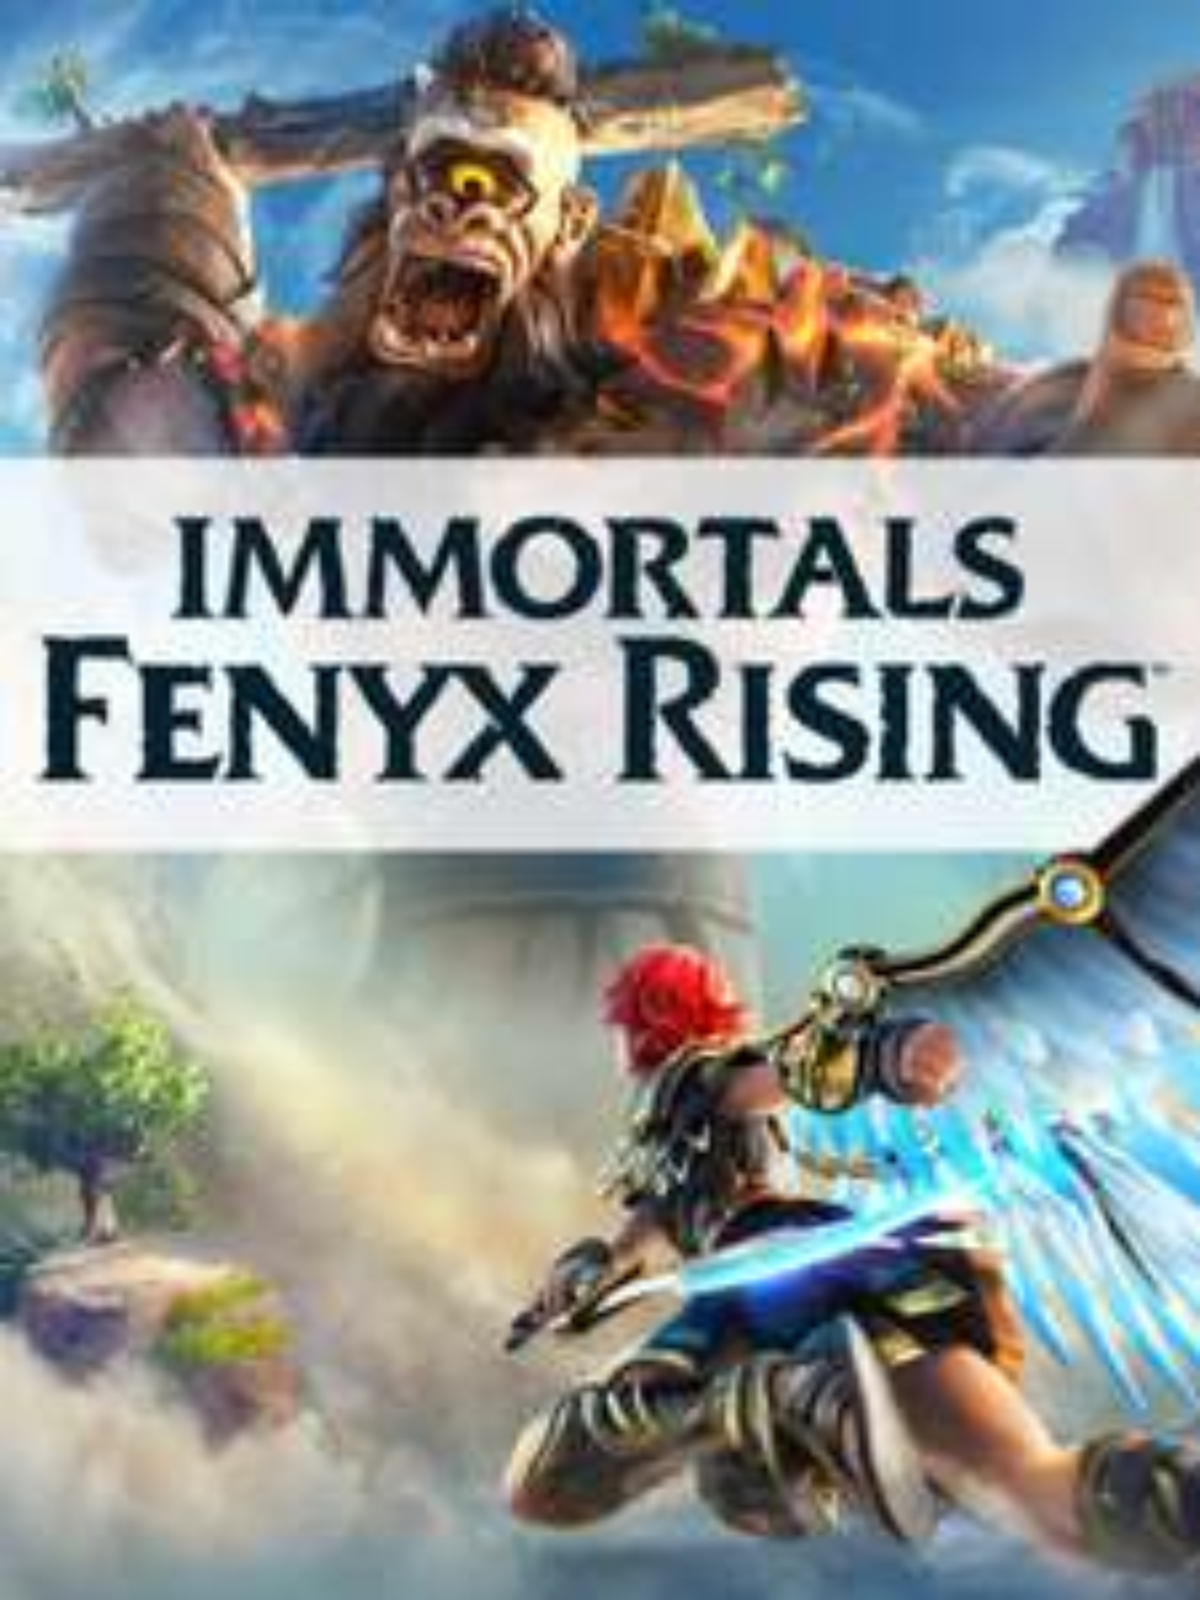 Immortals: Fenyx Rising [PC] @ Epic (met coupon)